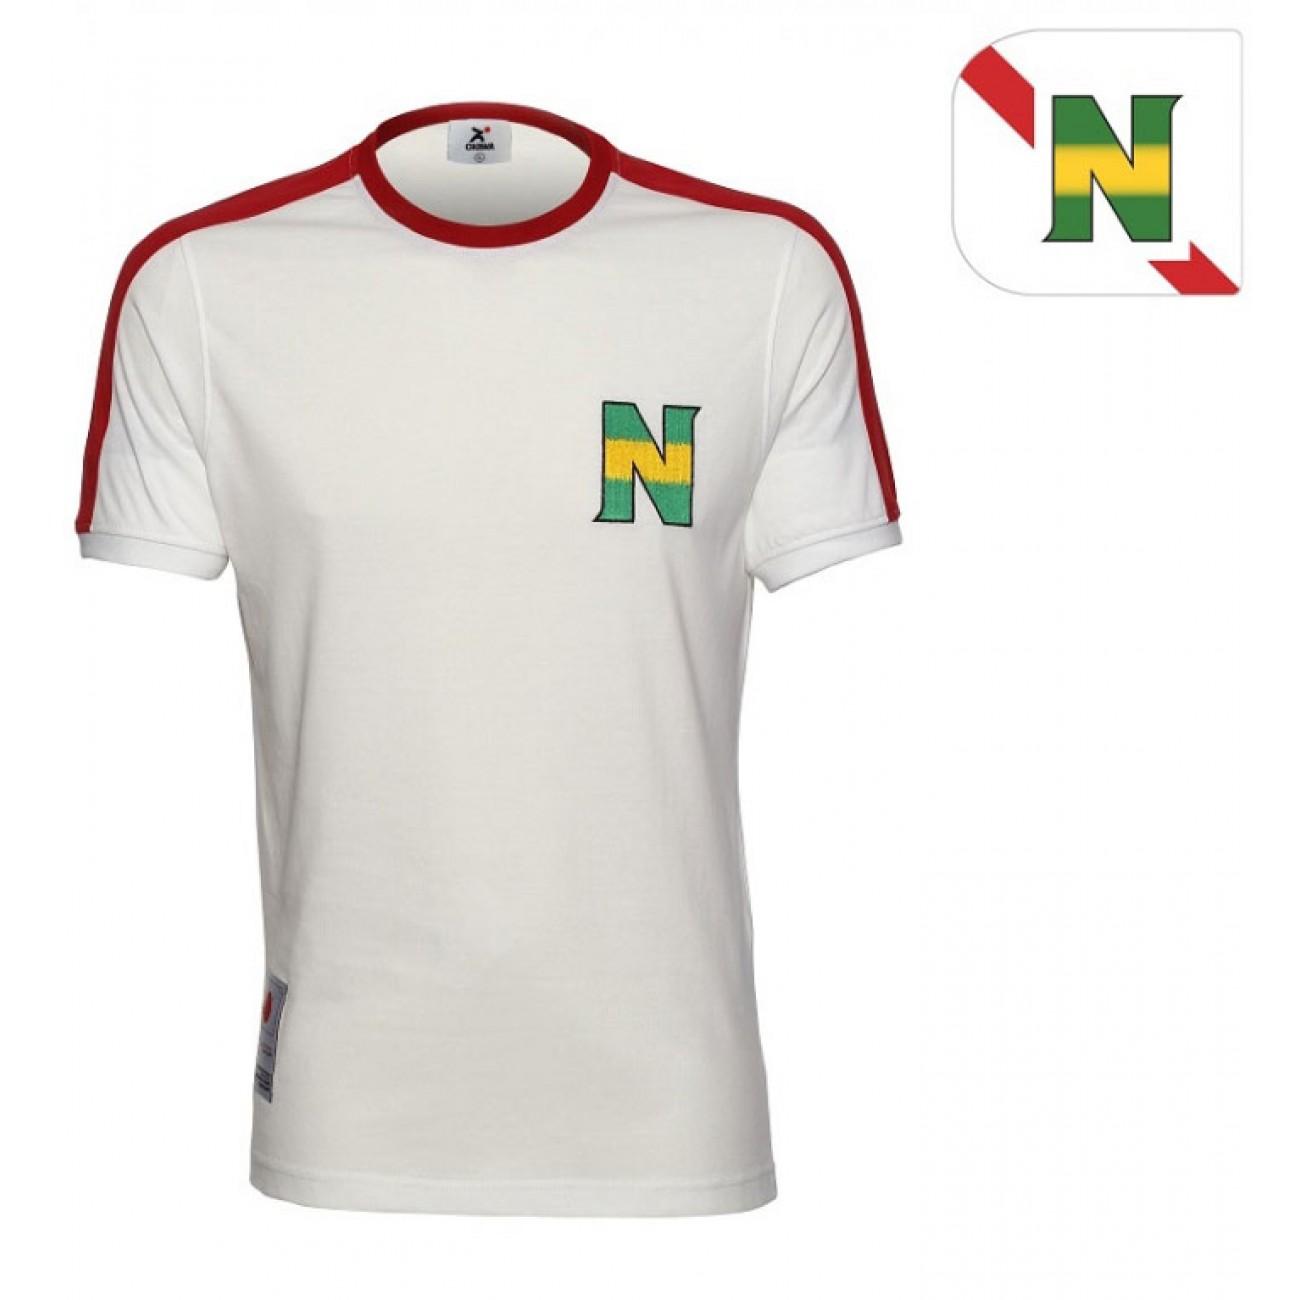 http://www.retrofootball.es/ropa-de-futbol/camiseta-new-team-1985.html